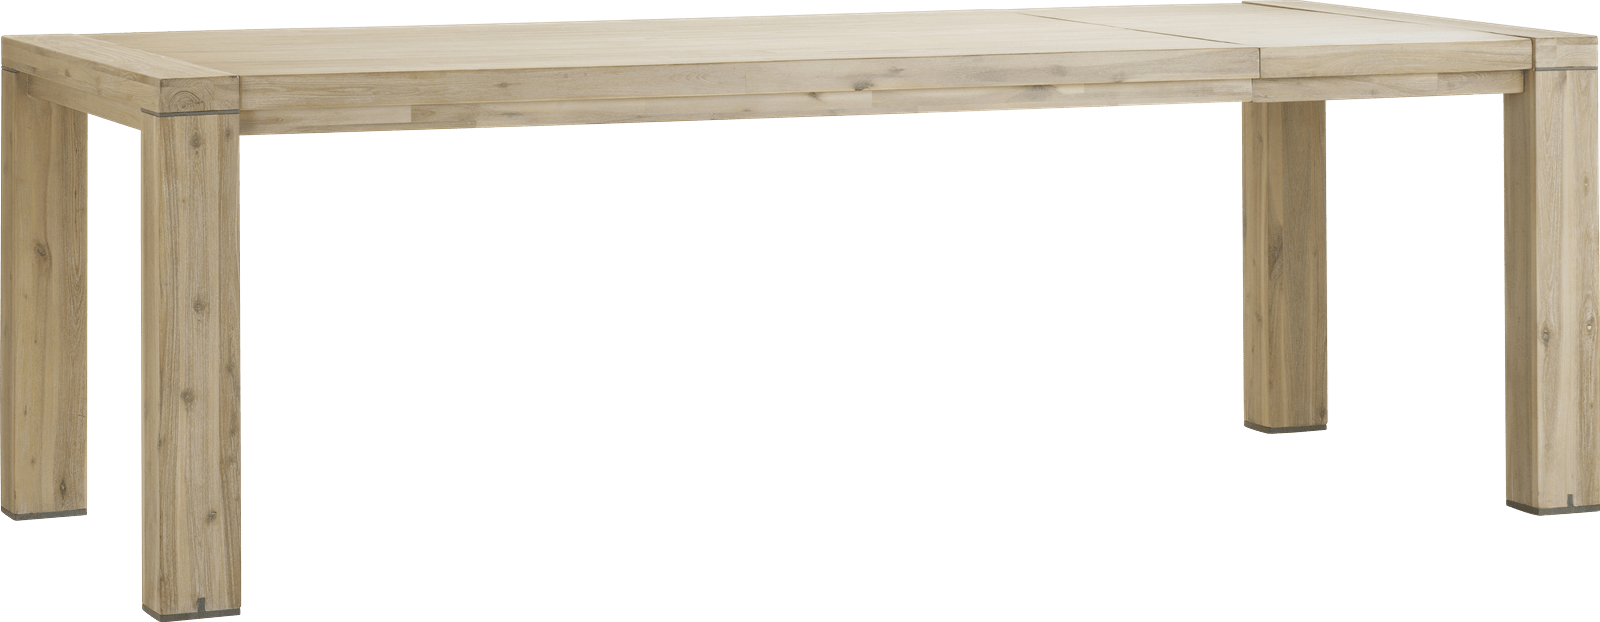 Buckley - table a rallonge 160 (+ 50 cm) x 100 cm